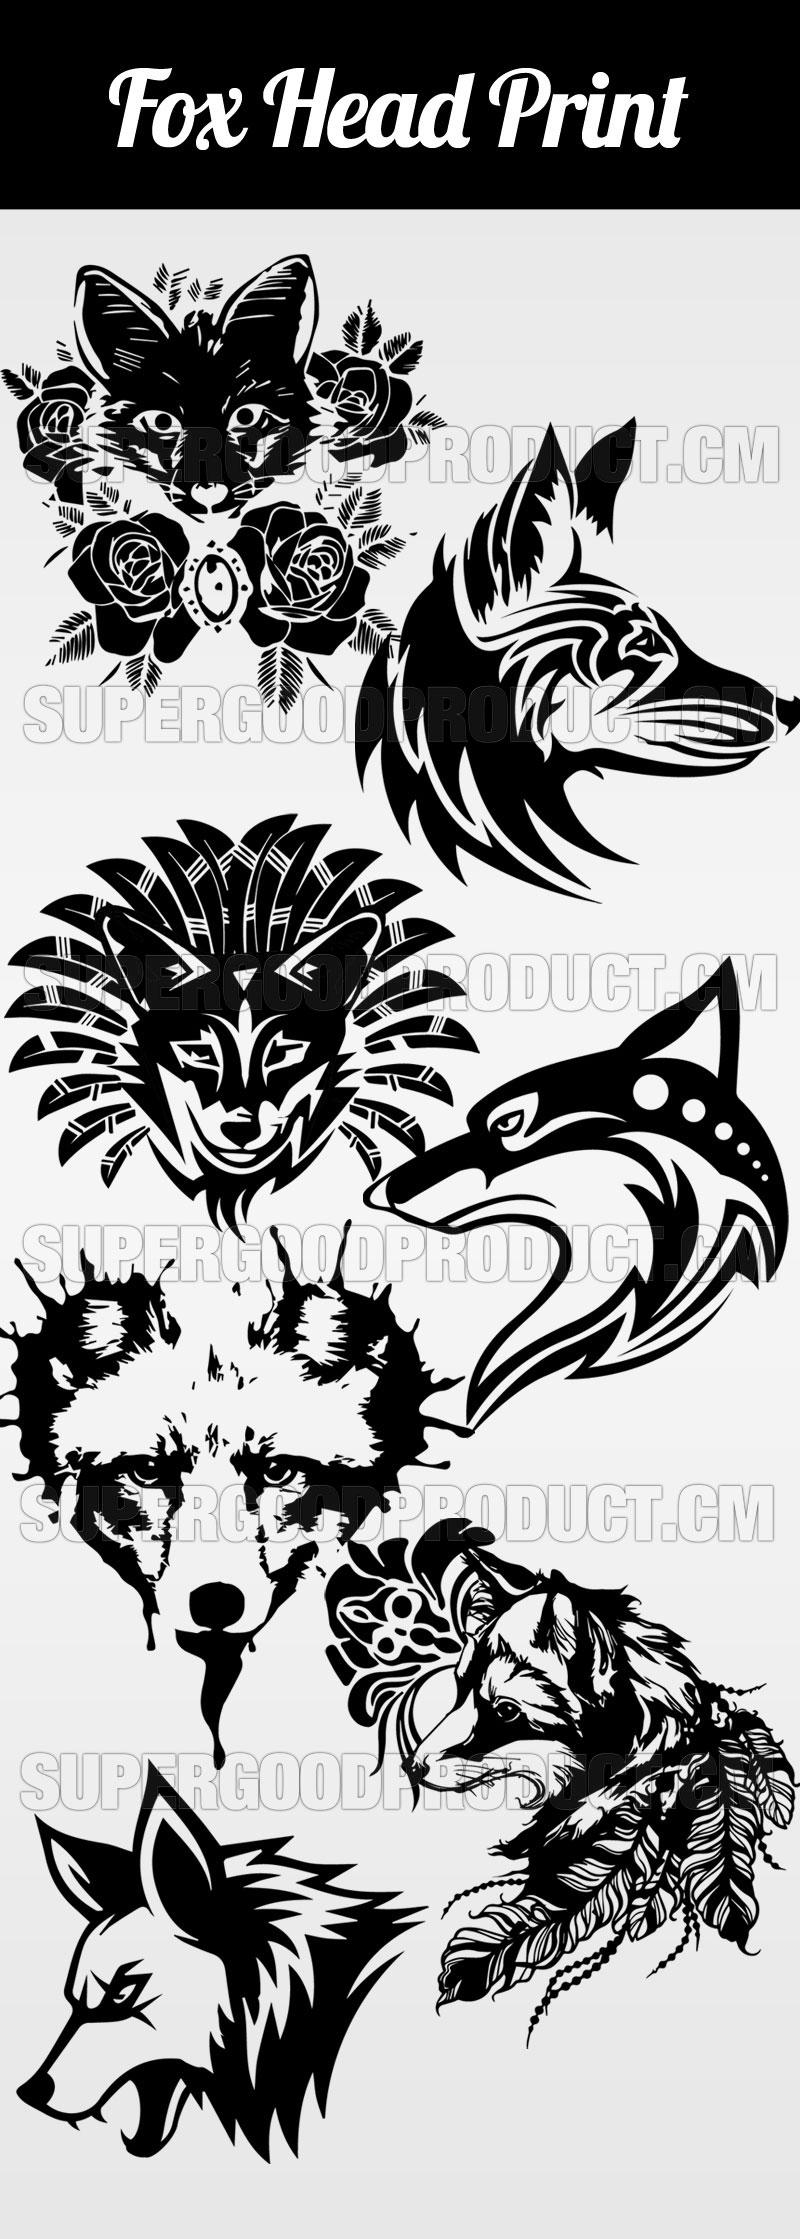 Fox-Head-Print